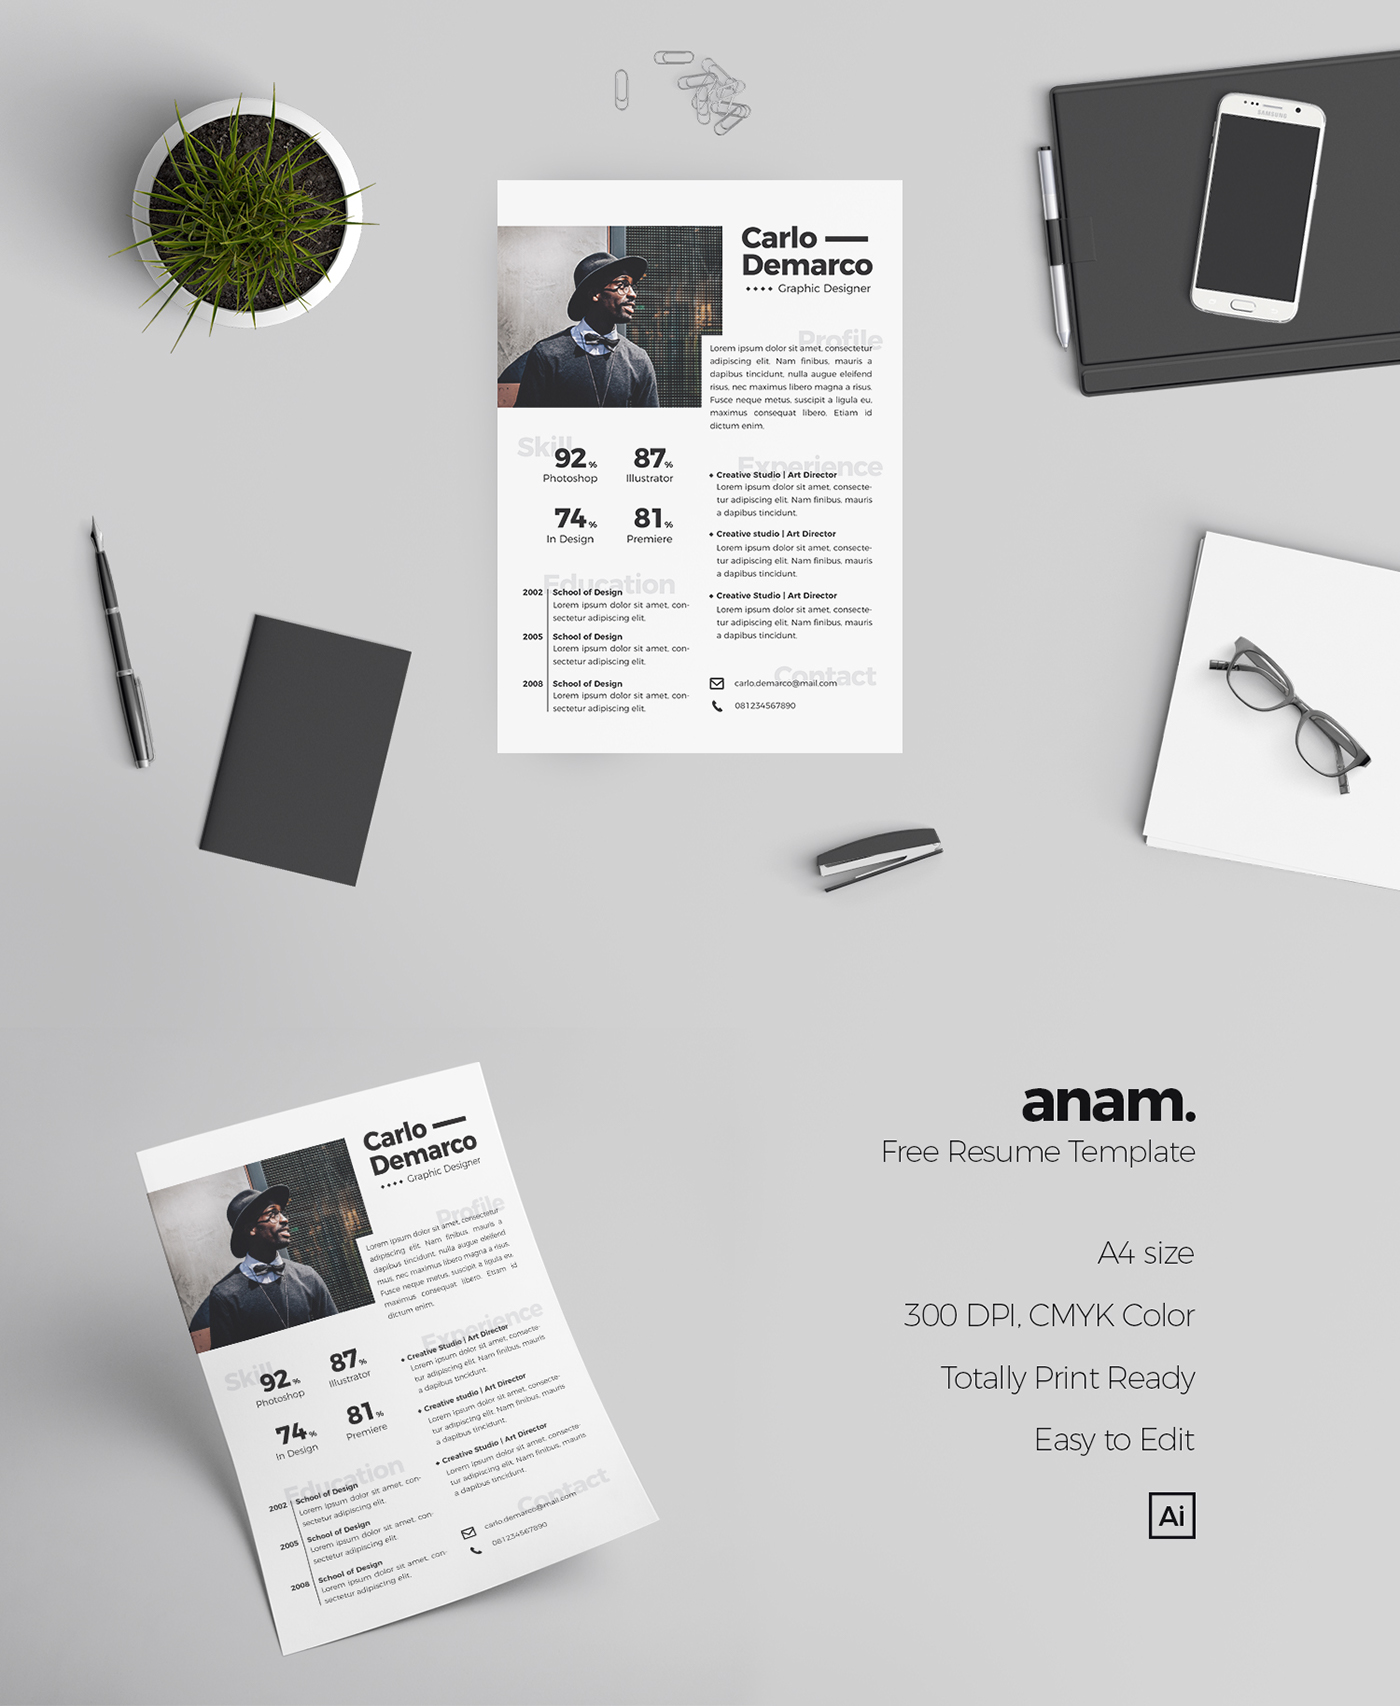 Resume template a4 minimalist modern design graphic design  anam adobe illustrator Adobe Photoshop